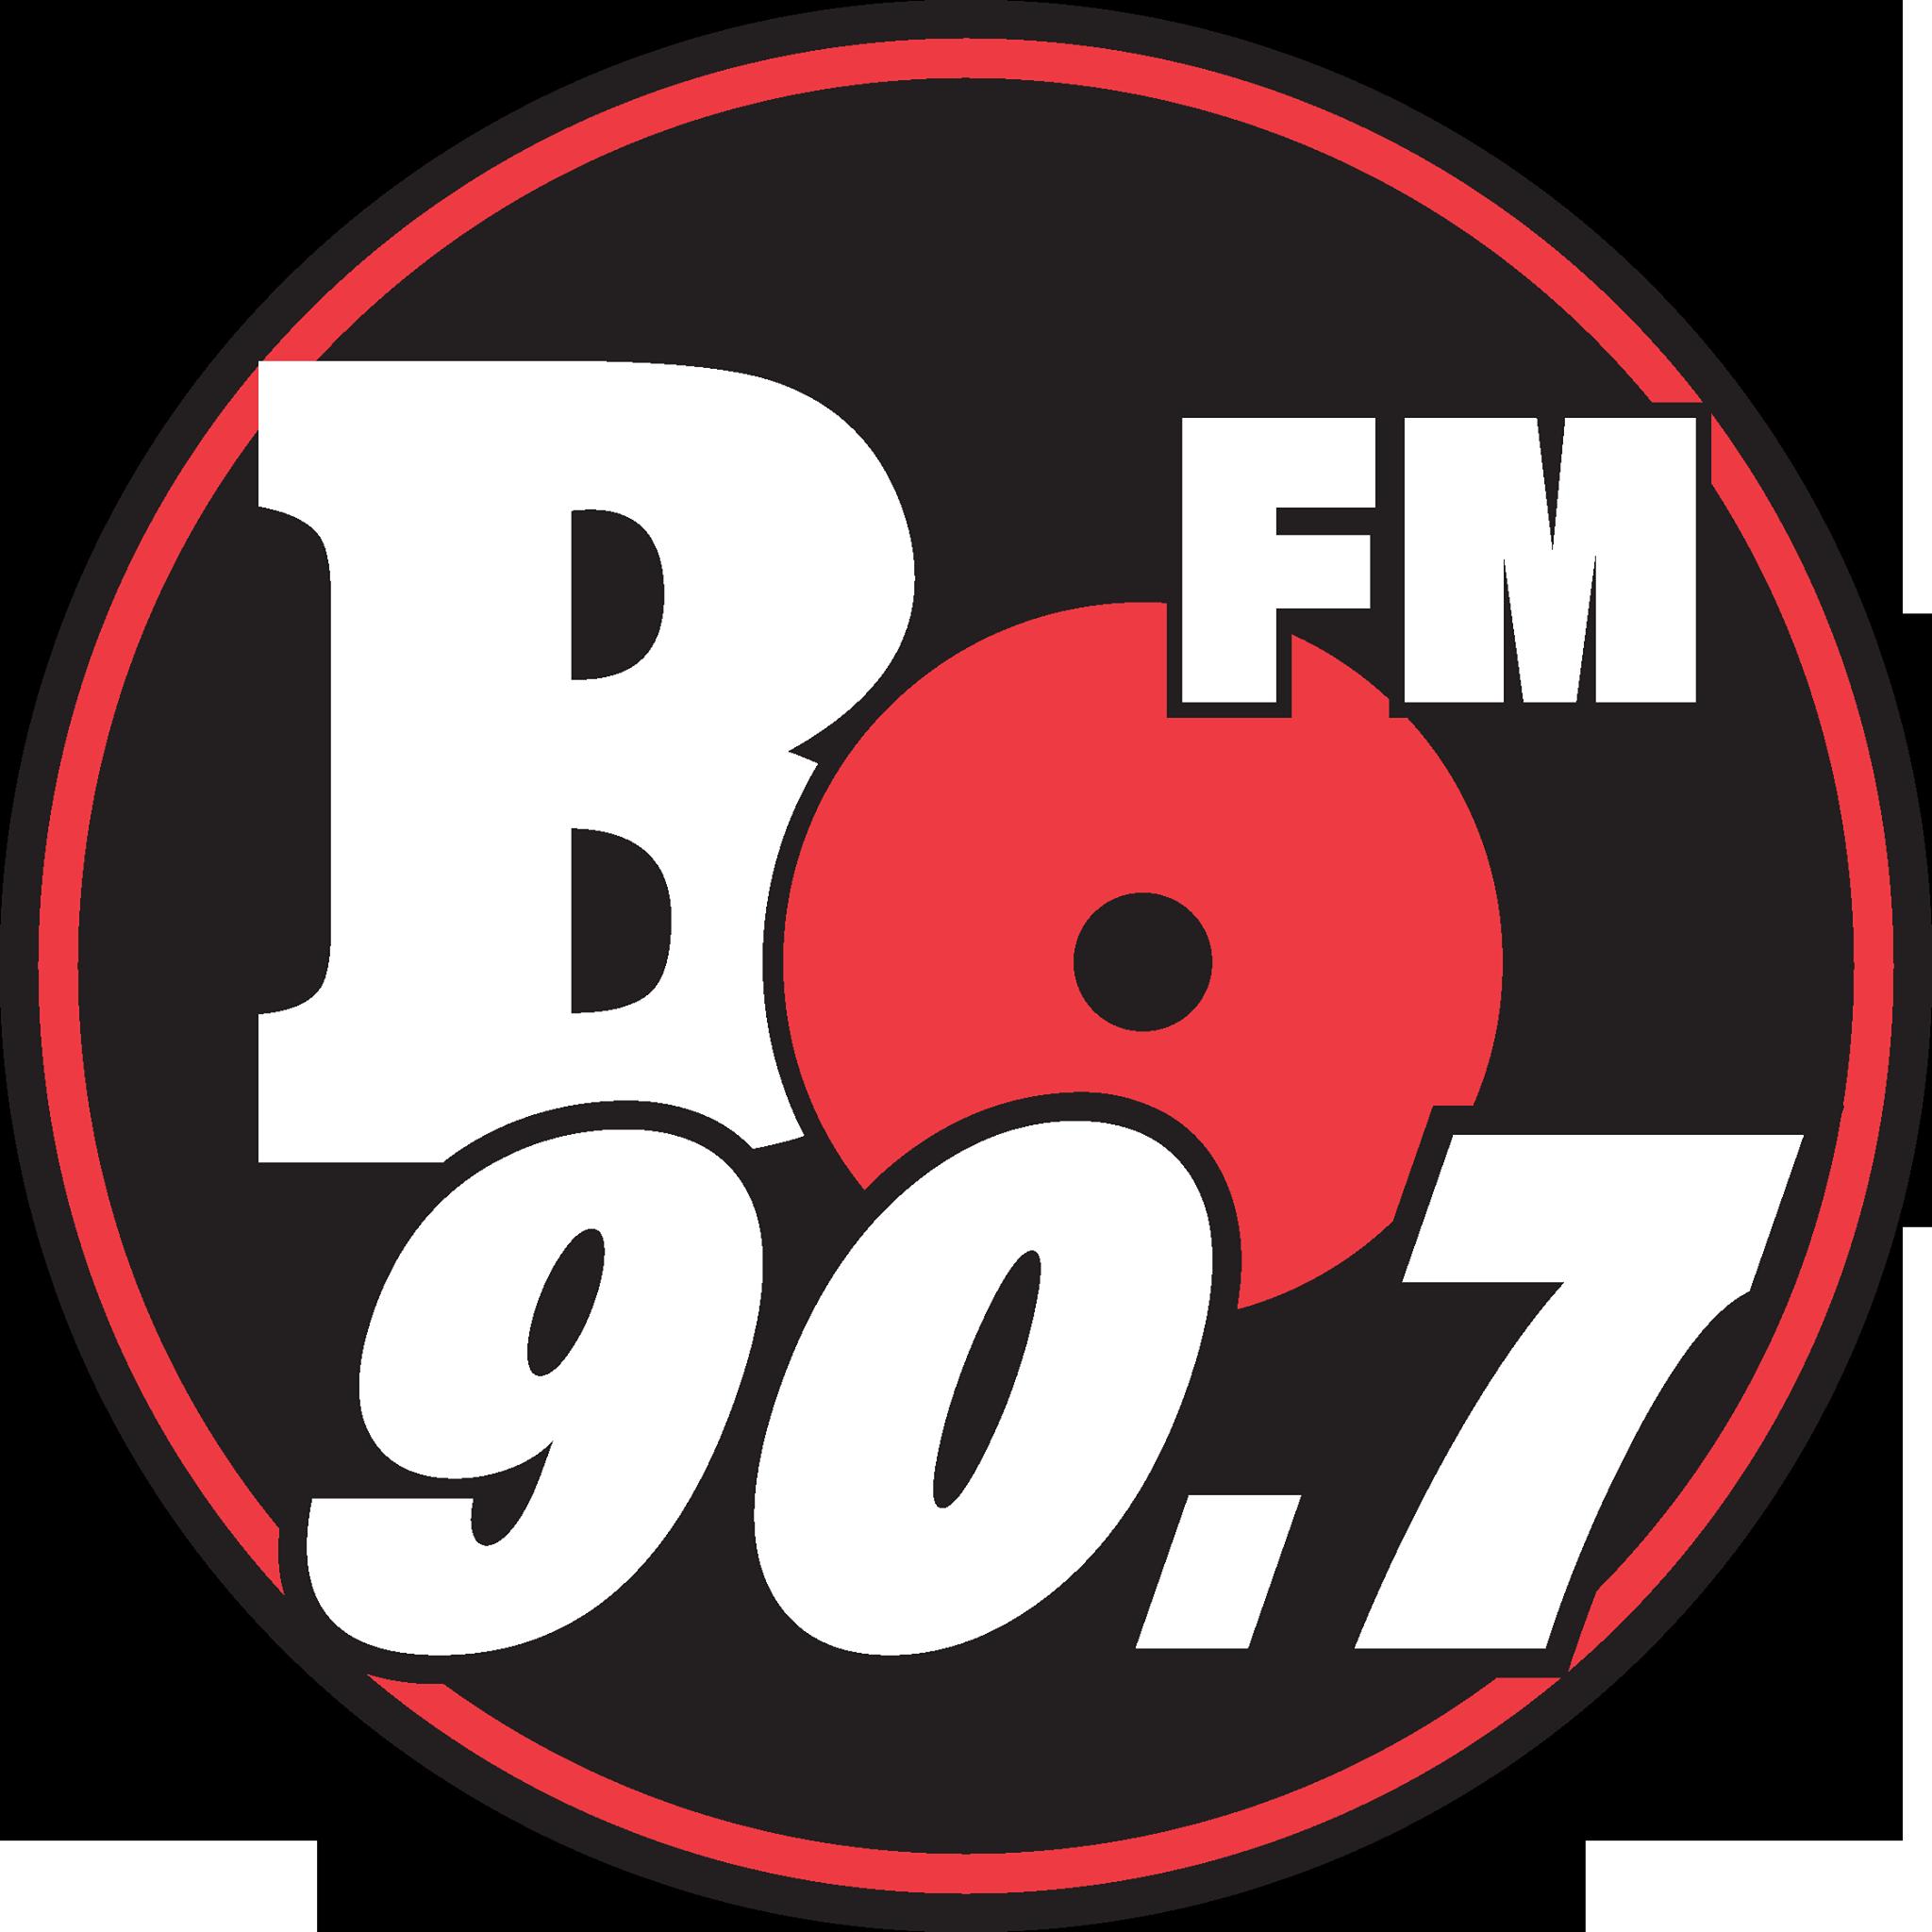 2017 logo commandite BOFM radio